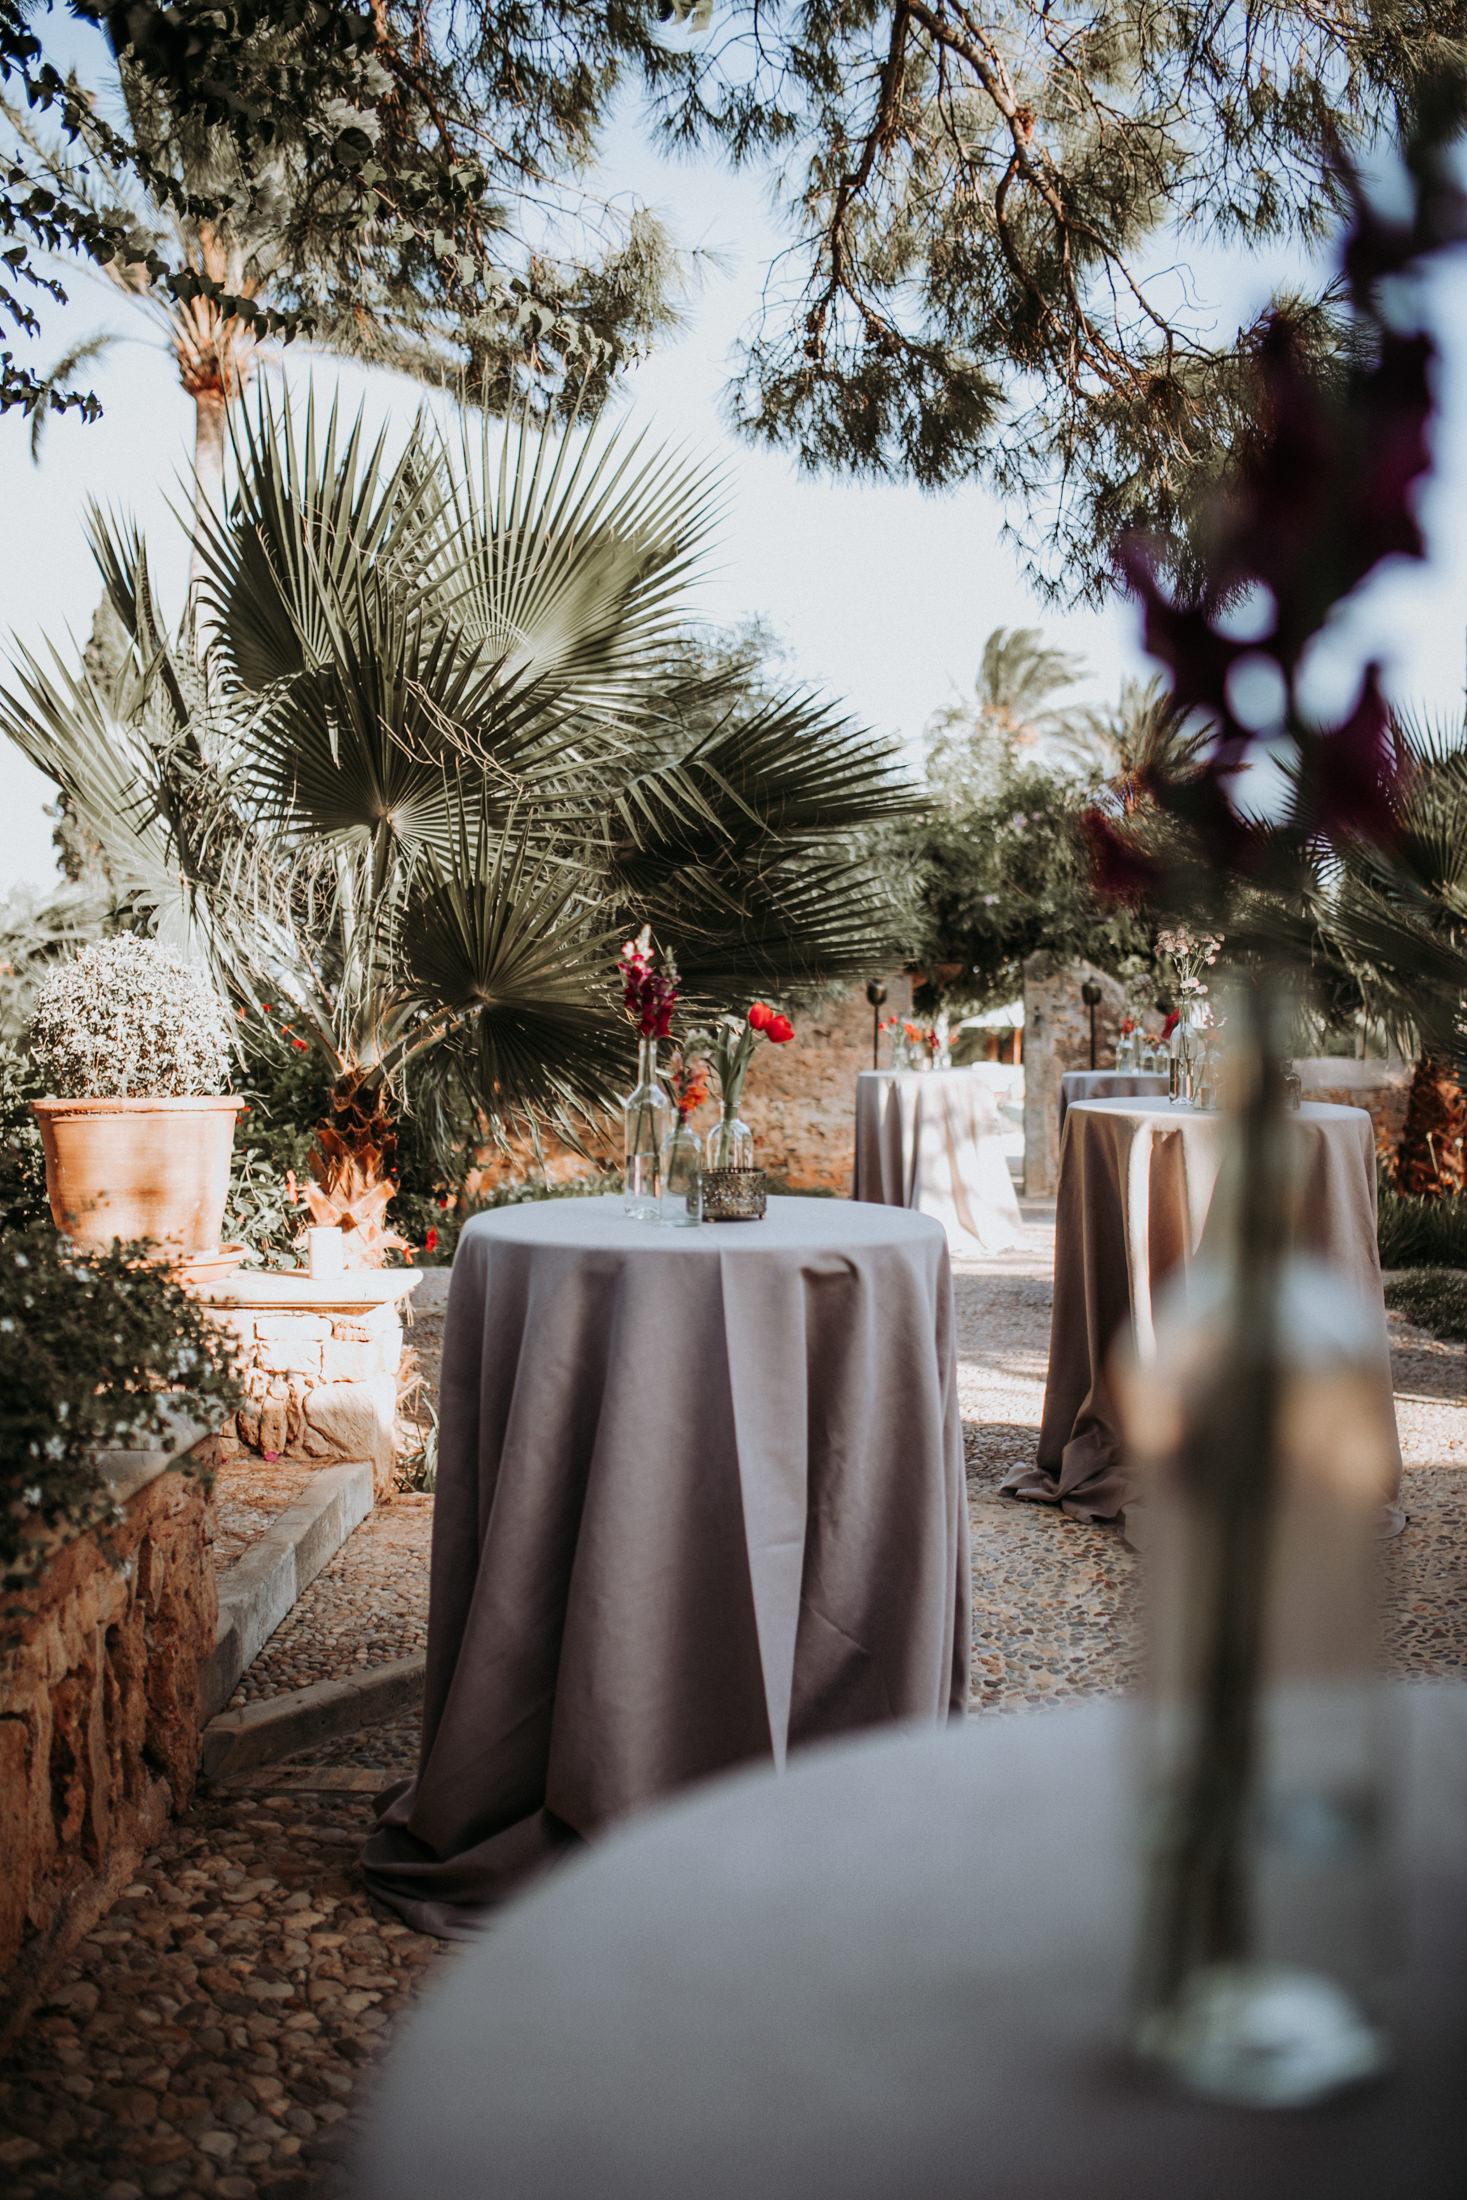 Wedding_Photographer_Mallorca_Daniela-Marquardt_Photography_New_York_Iceland_Tuscany_Santorini_Portugal_Austria_Bavaria_Elopement_Hochzeitsfotograf_AntjeRajat1_32